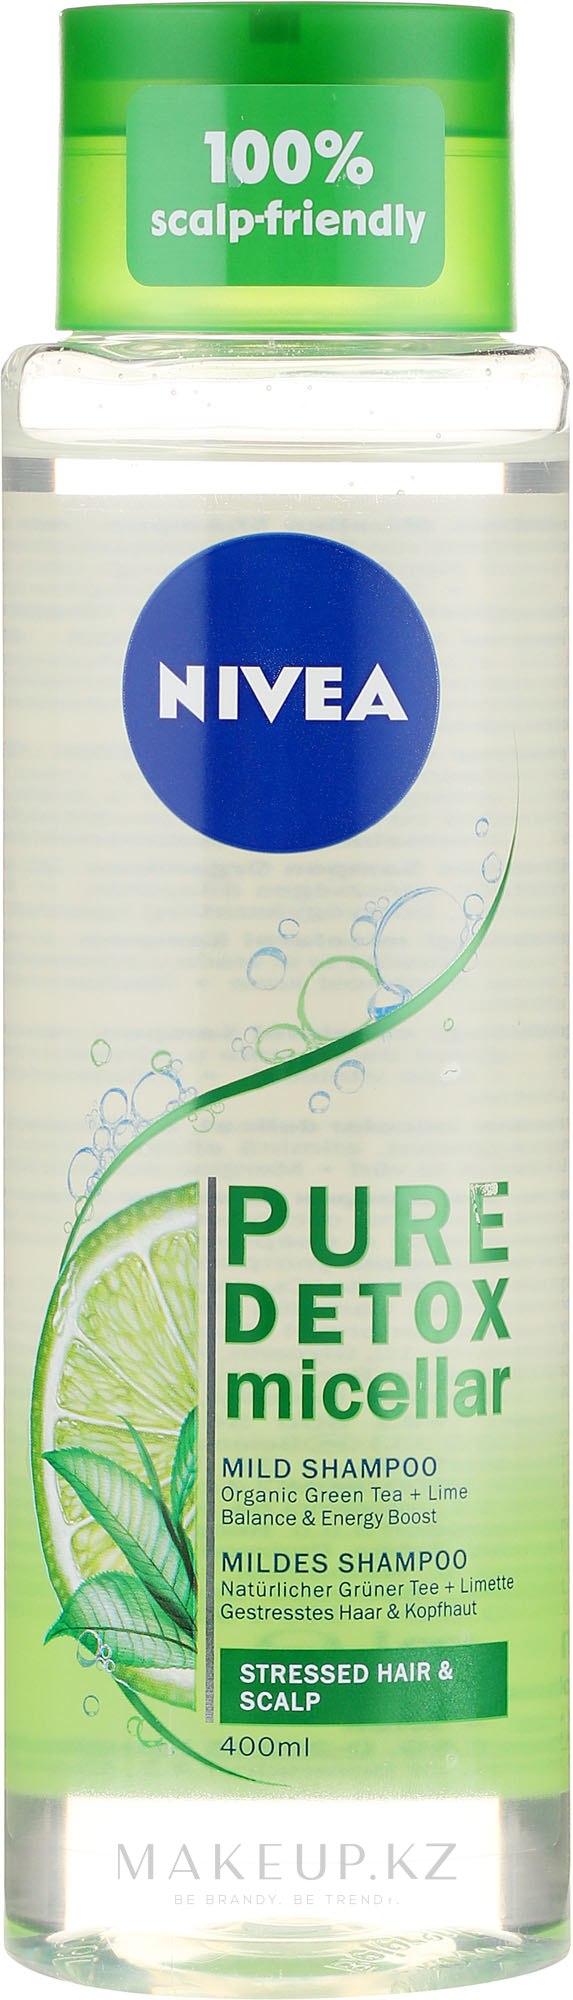 "Мицеллярный шампунь ""Детокс"" - Nivea Pure Detox Micellar Shampoo — фото 400 ml"